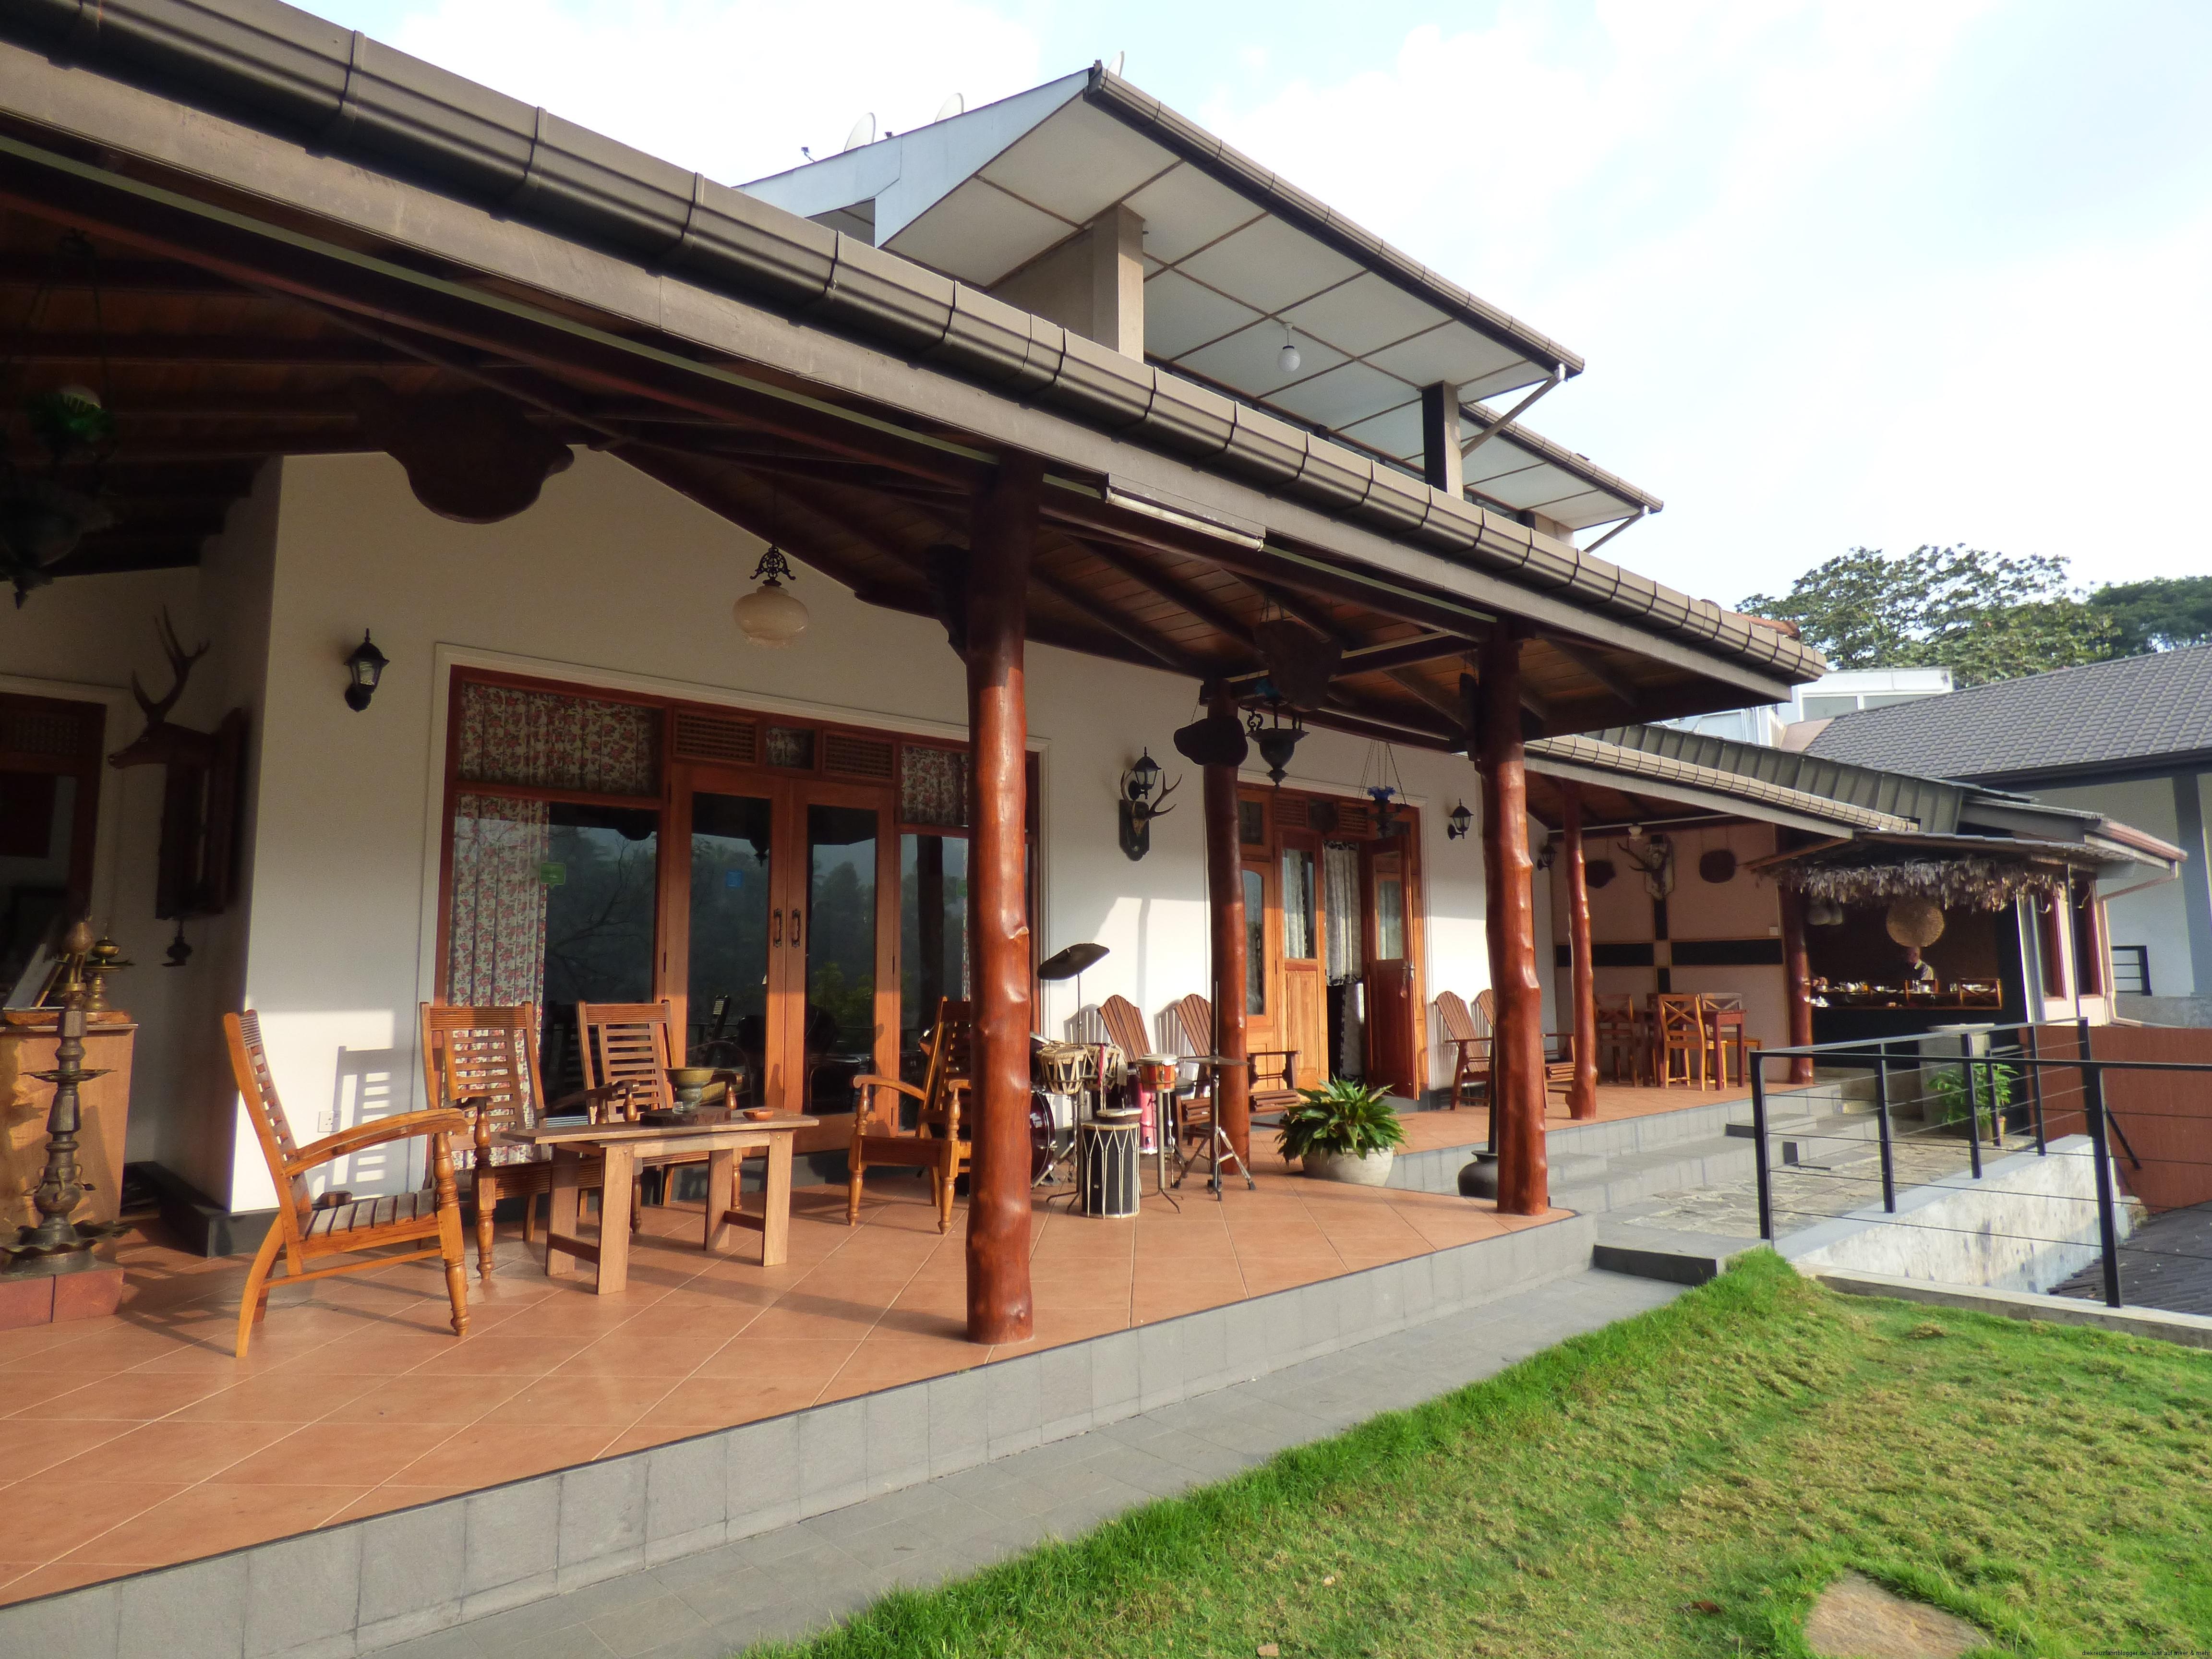 Kandy - Thoto Pola Residence Haus - Sri Lanka diekreuzfahrtblogger.de